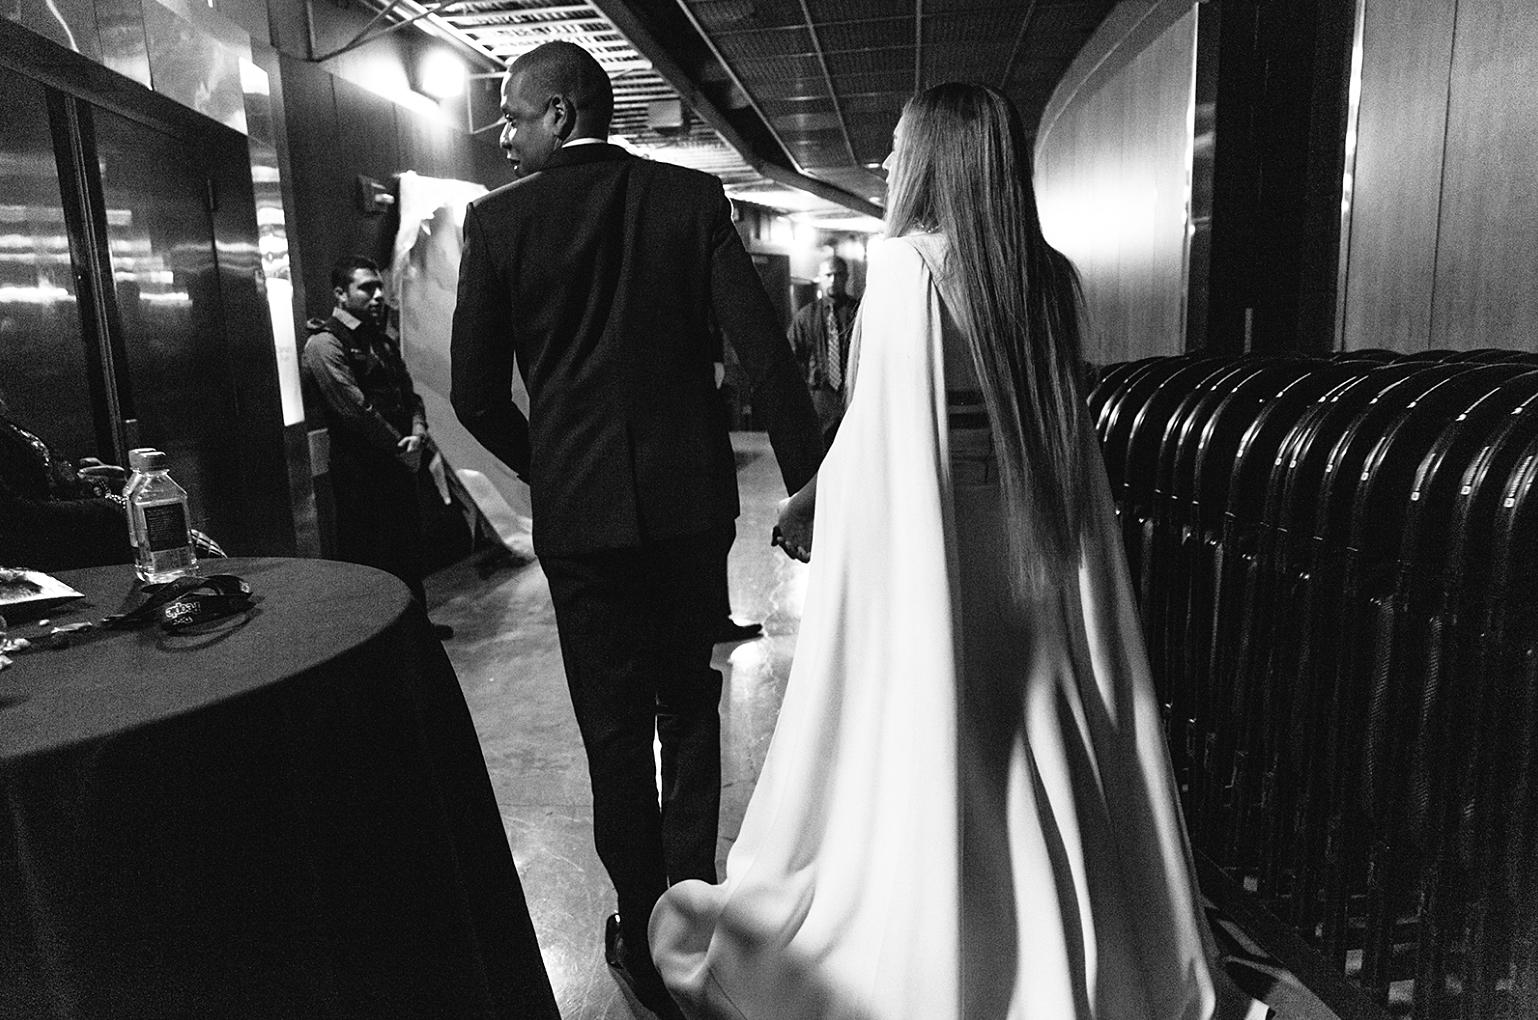 Beyonce Jay Z Grammys 2017 holding hands backstage